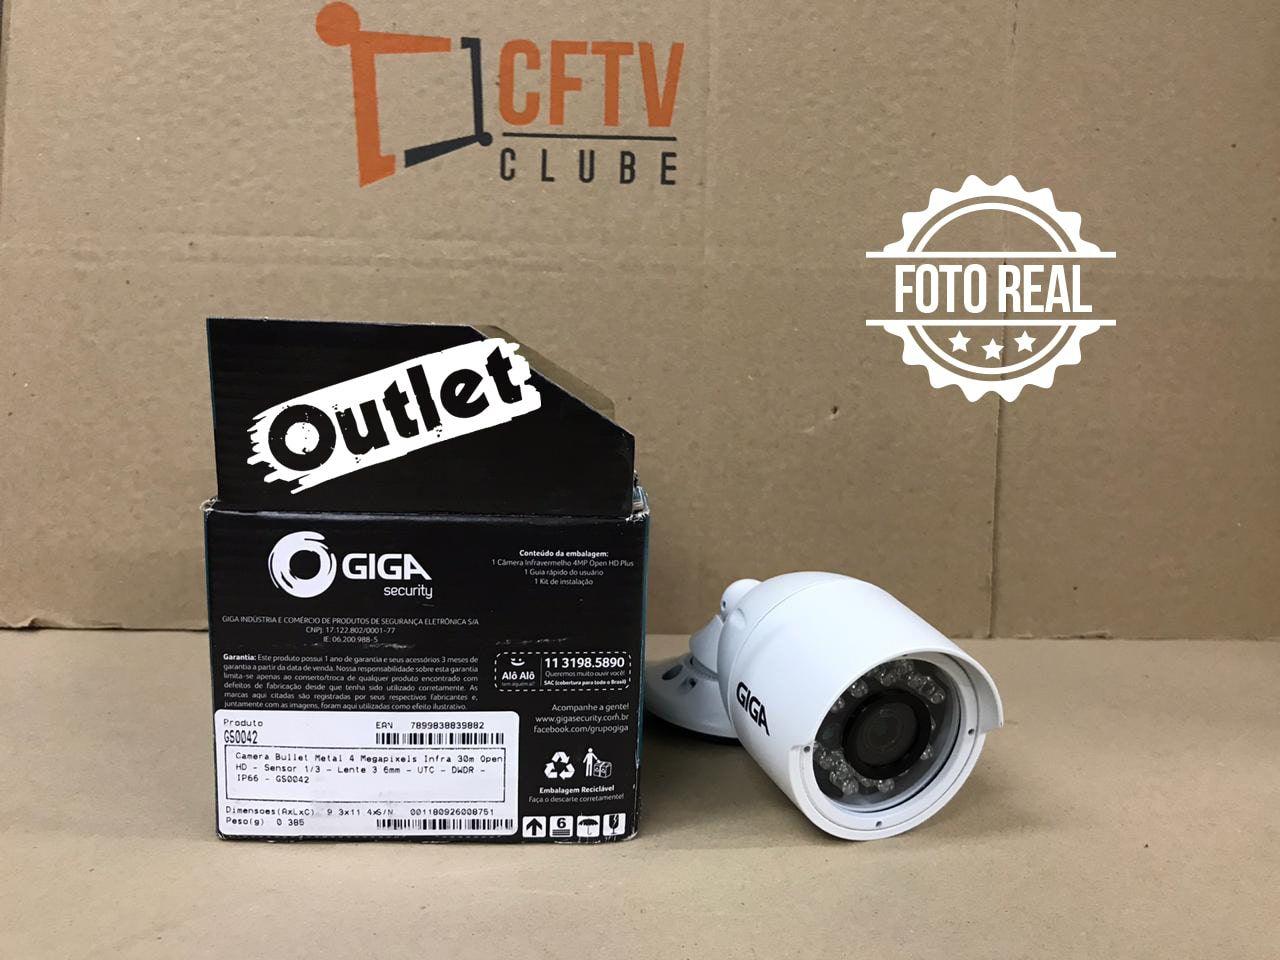 Outlet - Câmera Giga GS0042 Bullet Open HD IR 30M 4MM CMOS IP66 (4.0MP   1440p   3.6mm   Metal)  - CFTV Clube   Brasil